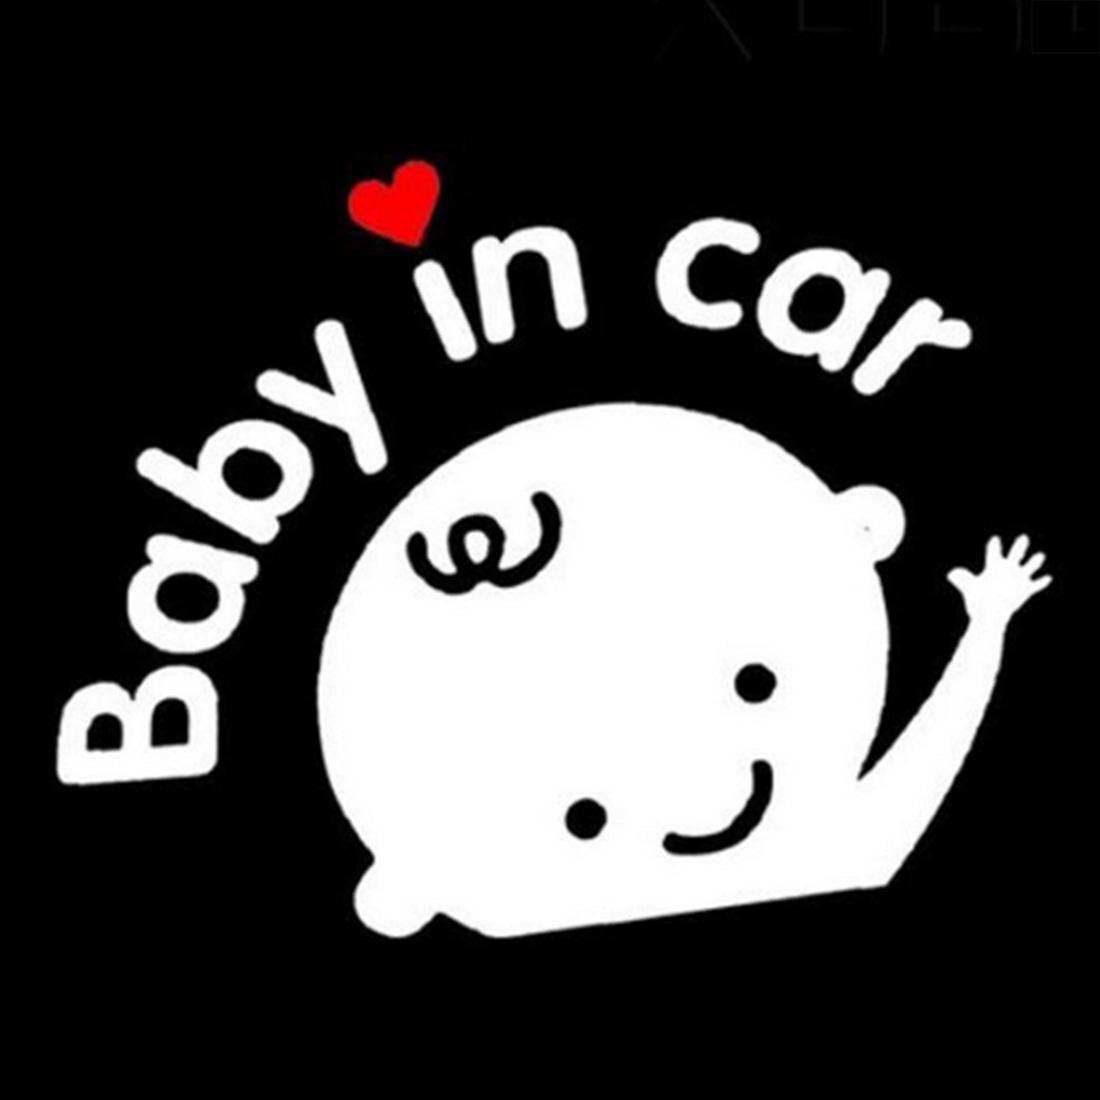 Delinks Plisket Long Pants Bcpj18100 Blue Daftar Harga Terbaru Dan High Quality Clothing Baby In Carwaving On Car Cartoon Safety Sign Self Adhesive Decal Sticker Green Intl